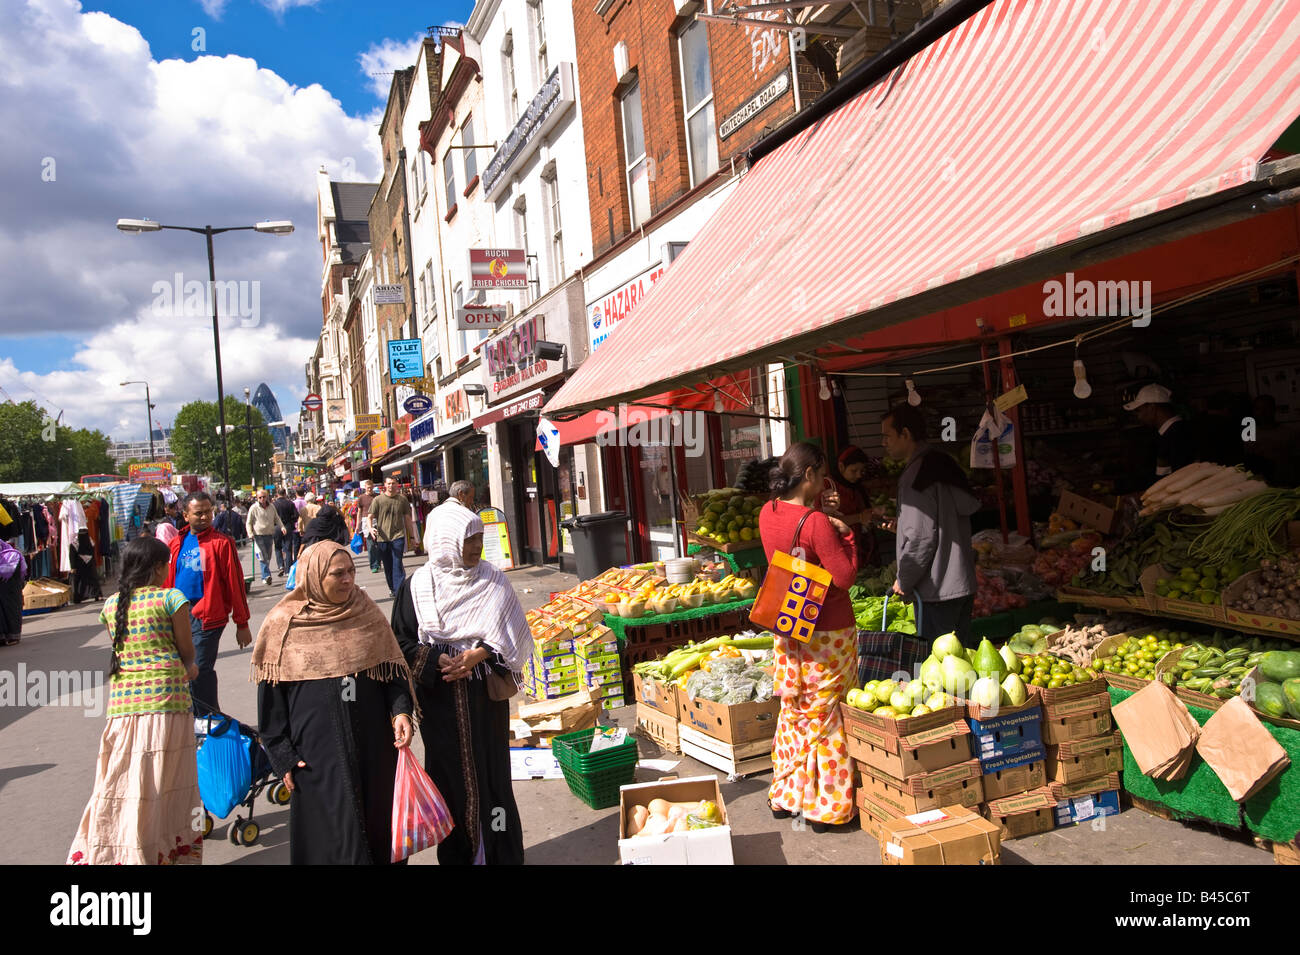 Whitechapel Road Market Whitechapel E1 London United Kingdom Stock Photo